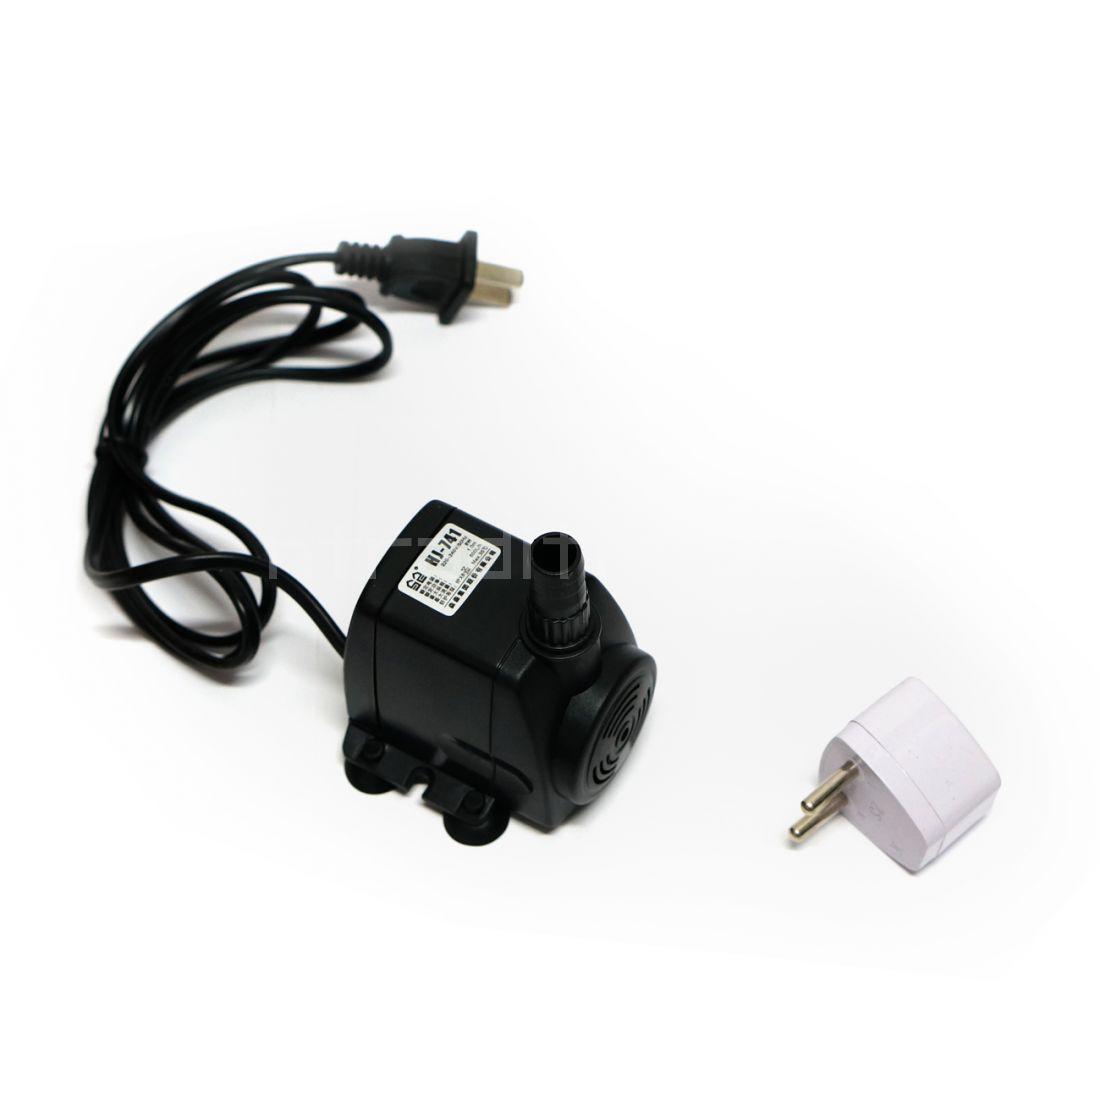 Компрессор для автономного охлаждения (8W,600 л./ч.)